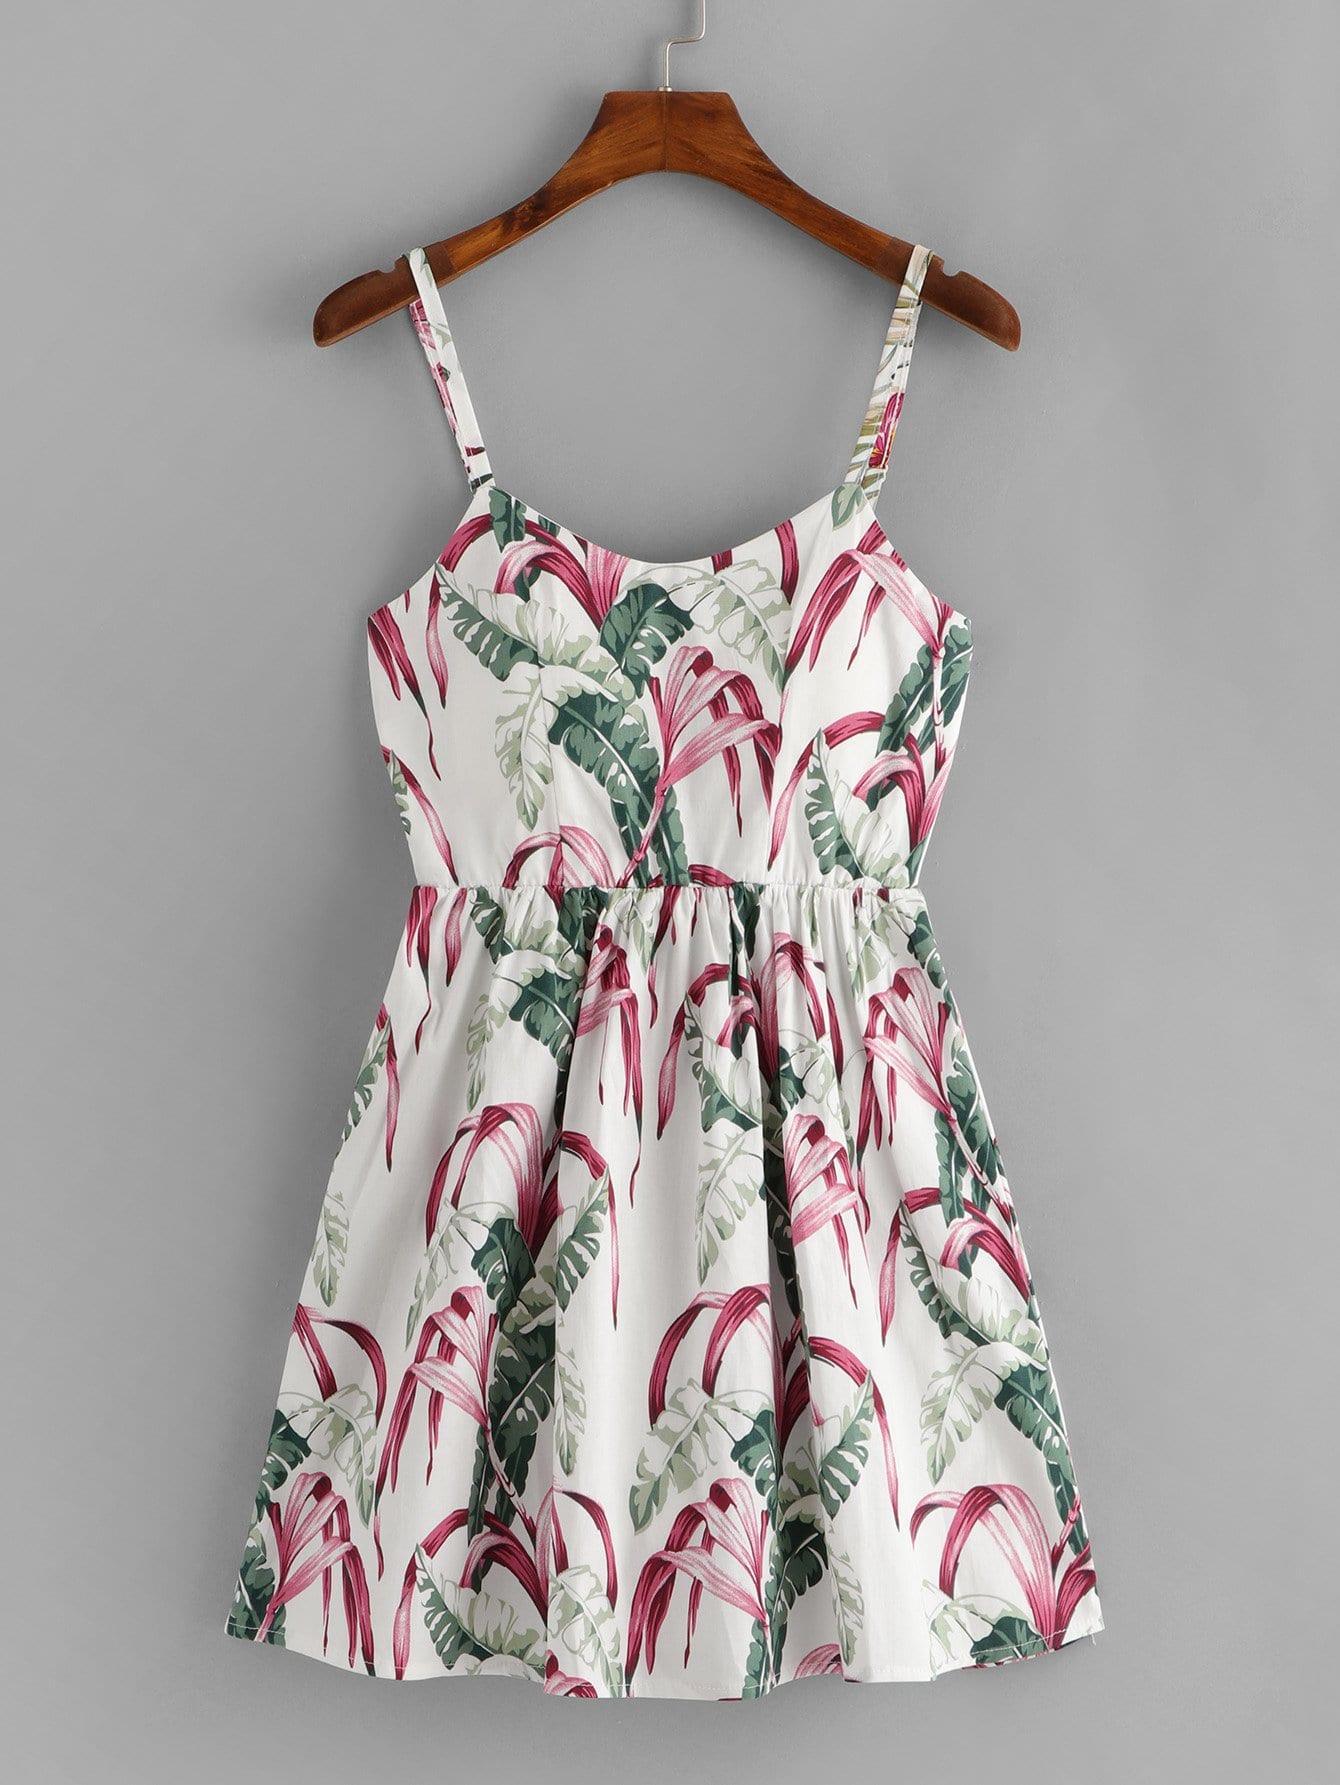 Tropical Print Lace Up Back Cami Dress